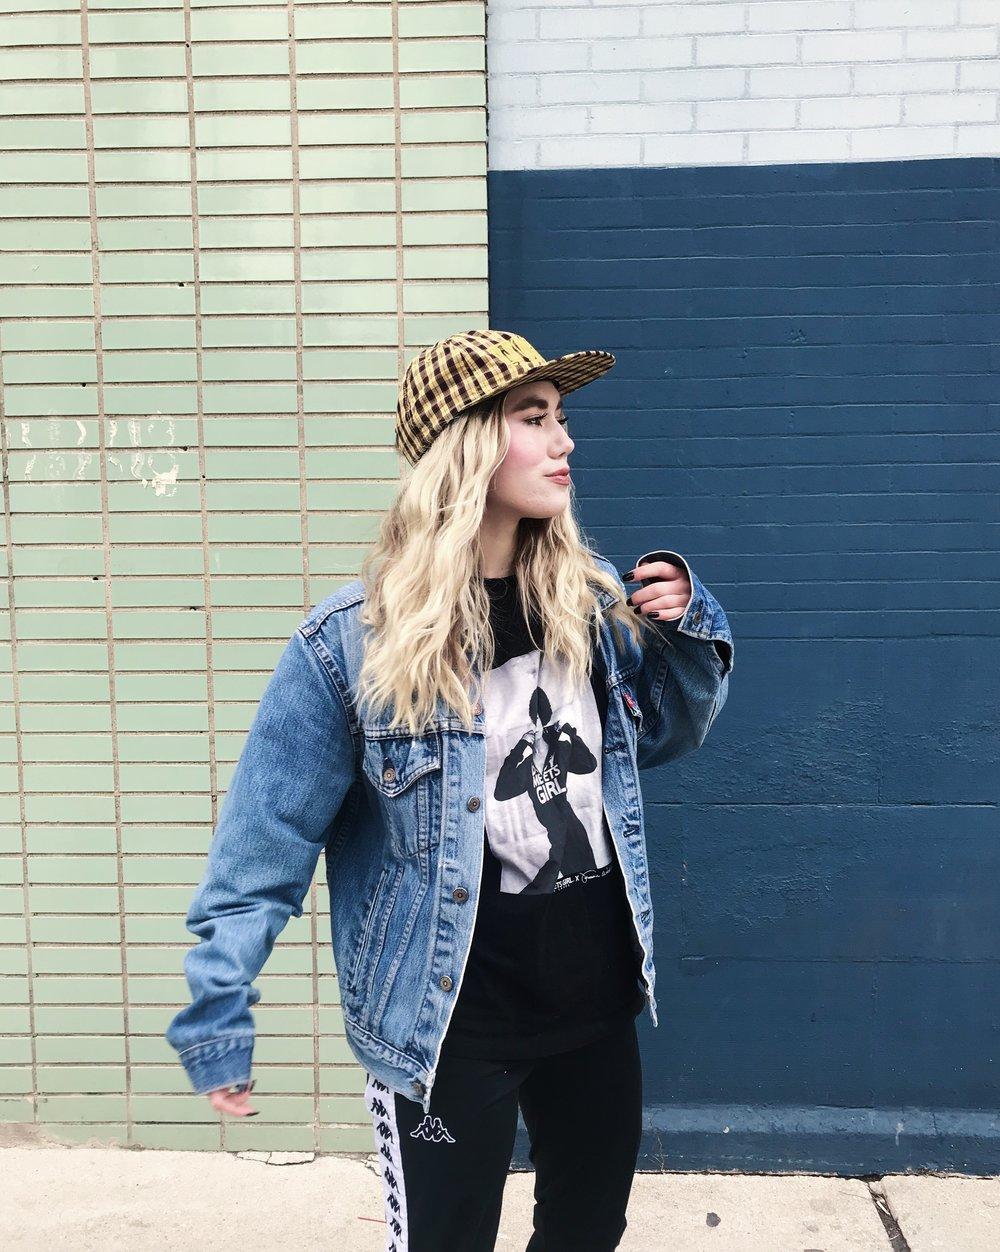 hype-bae-inspired-outfit-kappa-track-pants.JPG